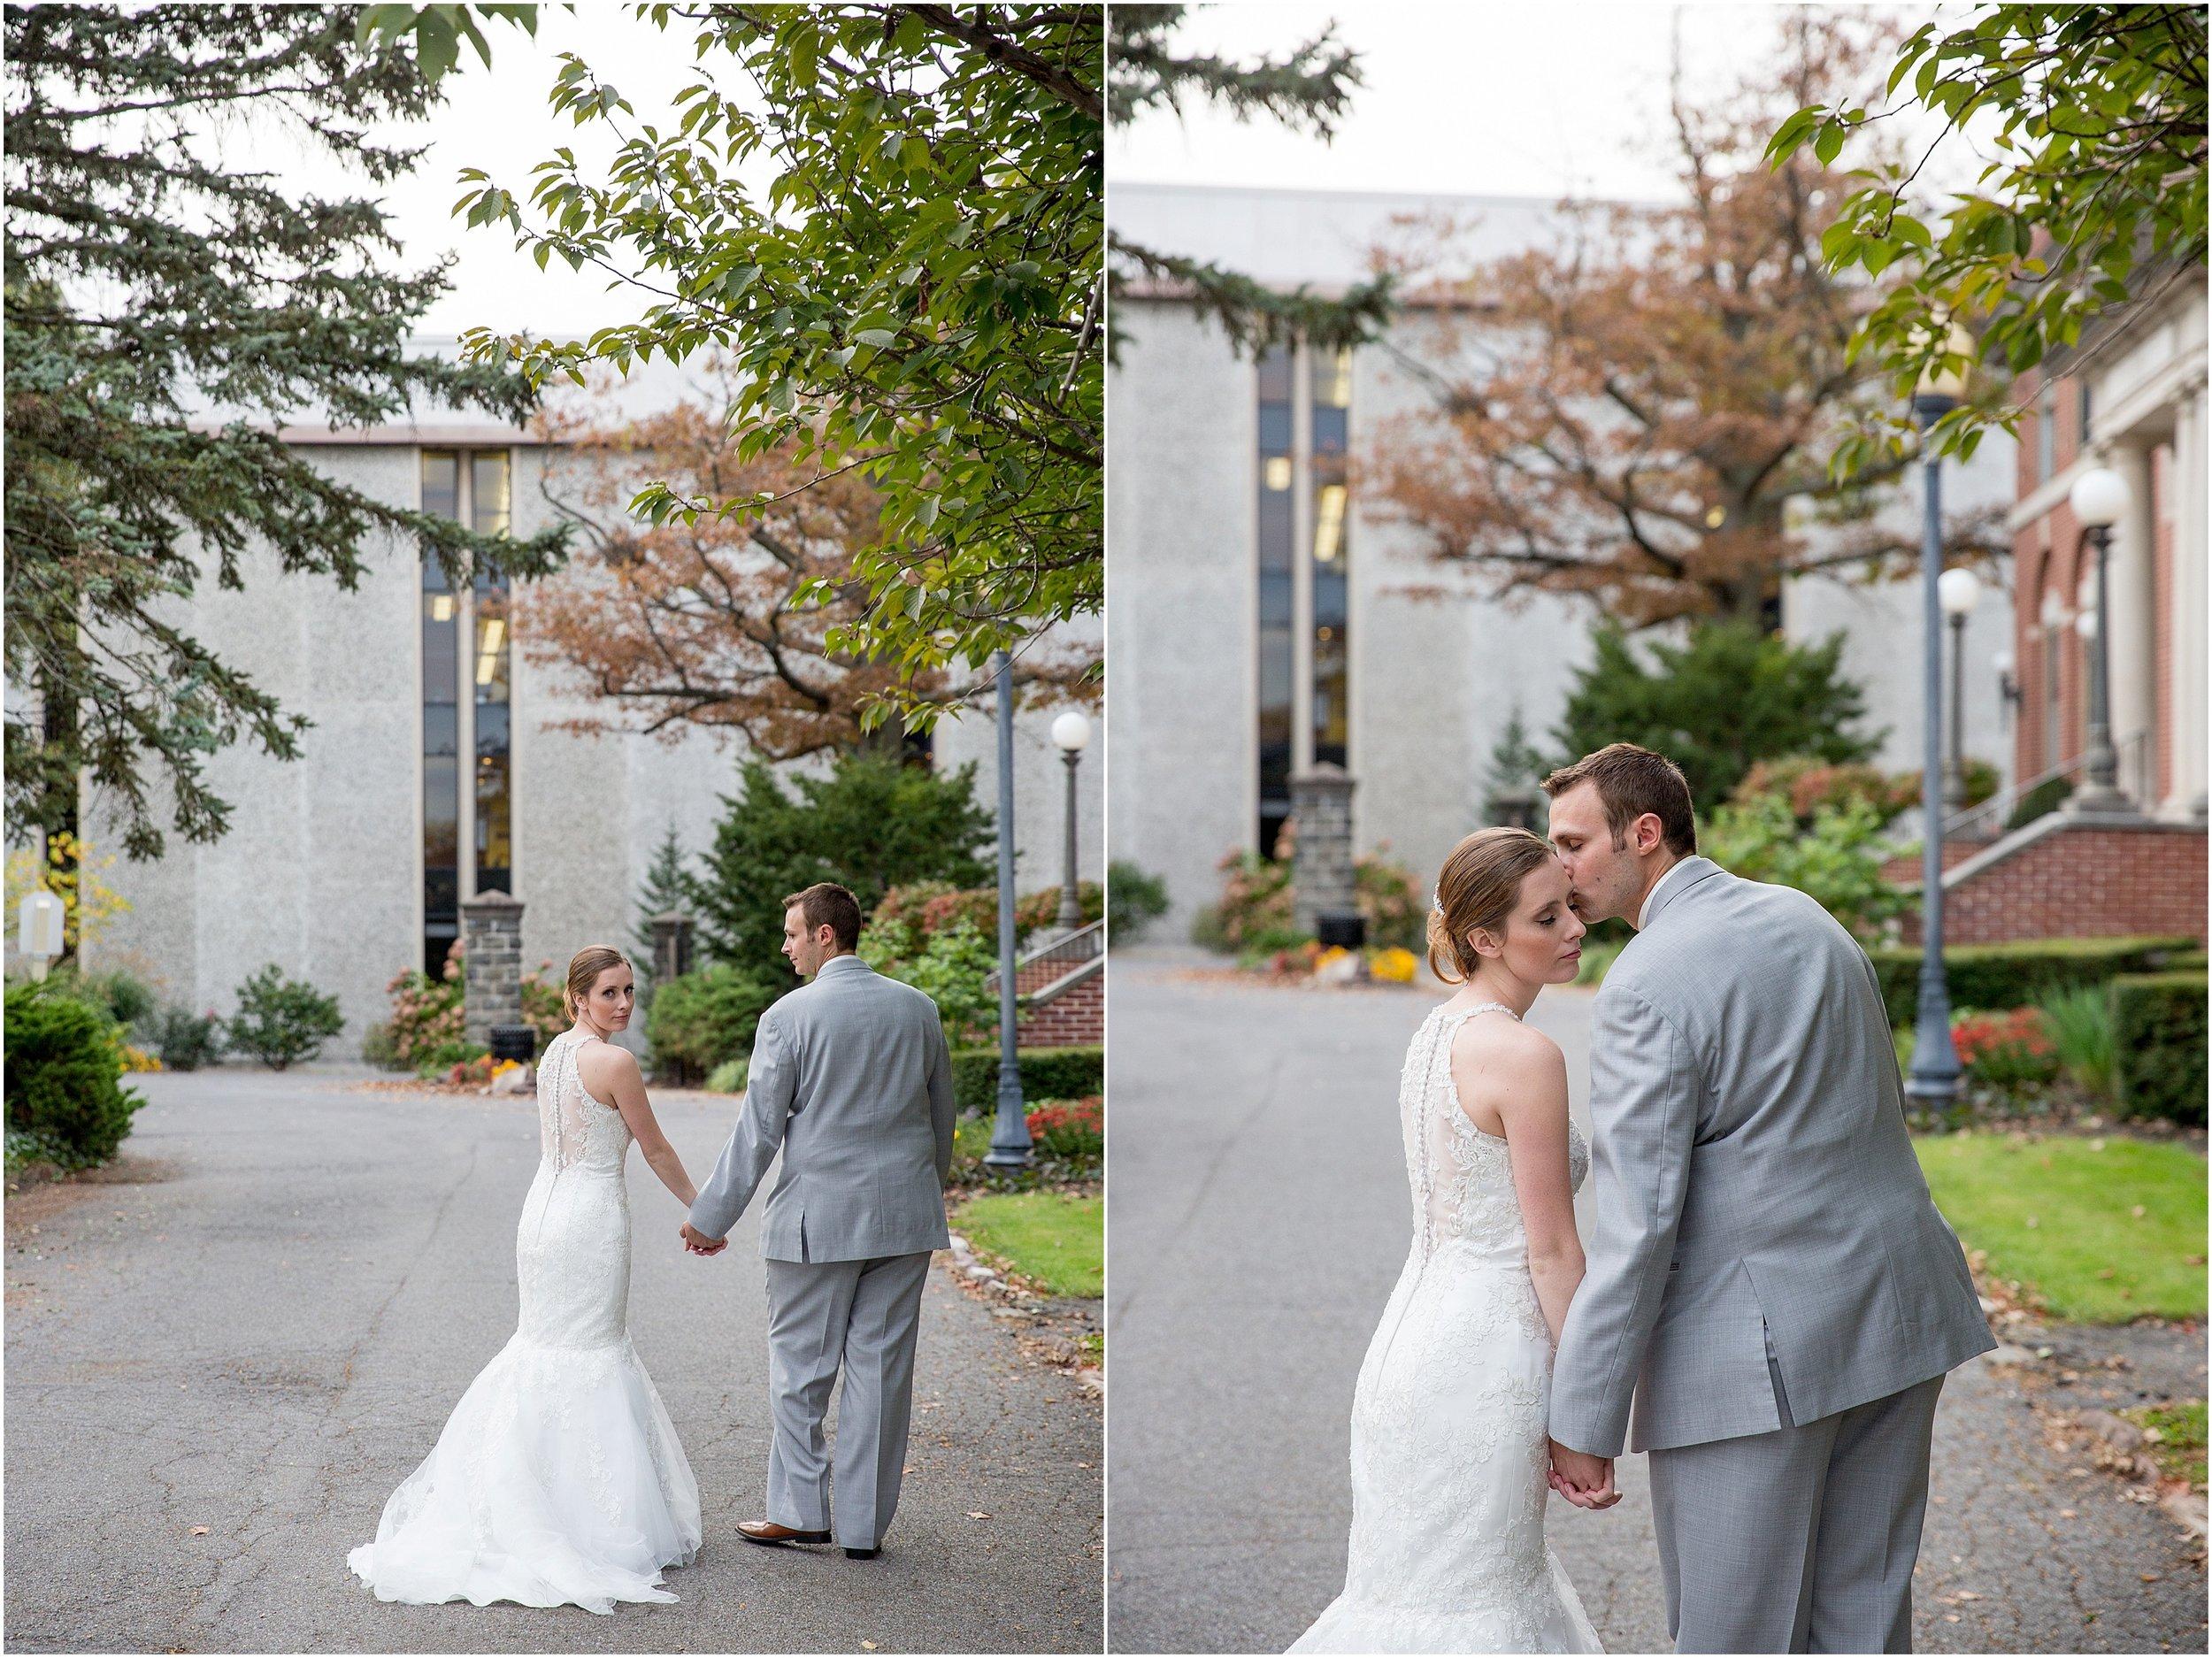 Williamsport_Wedding_0047.jpg